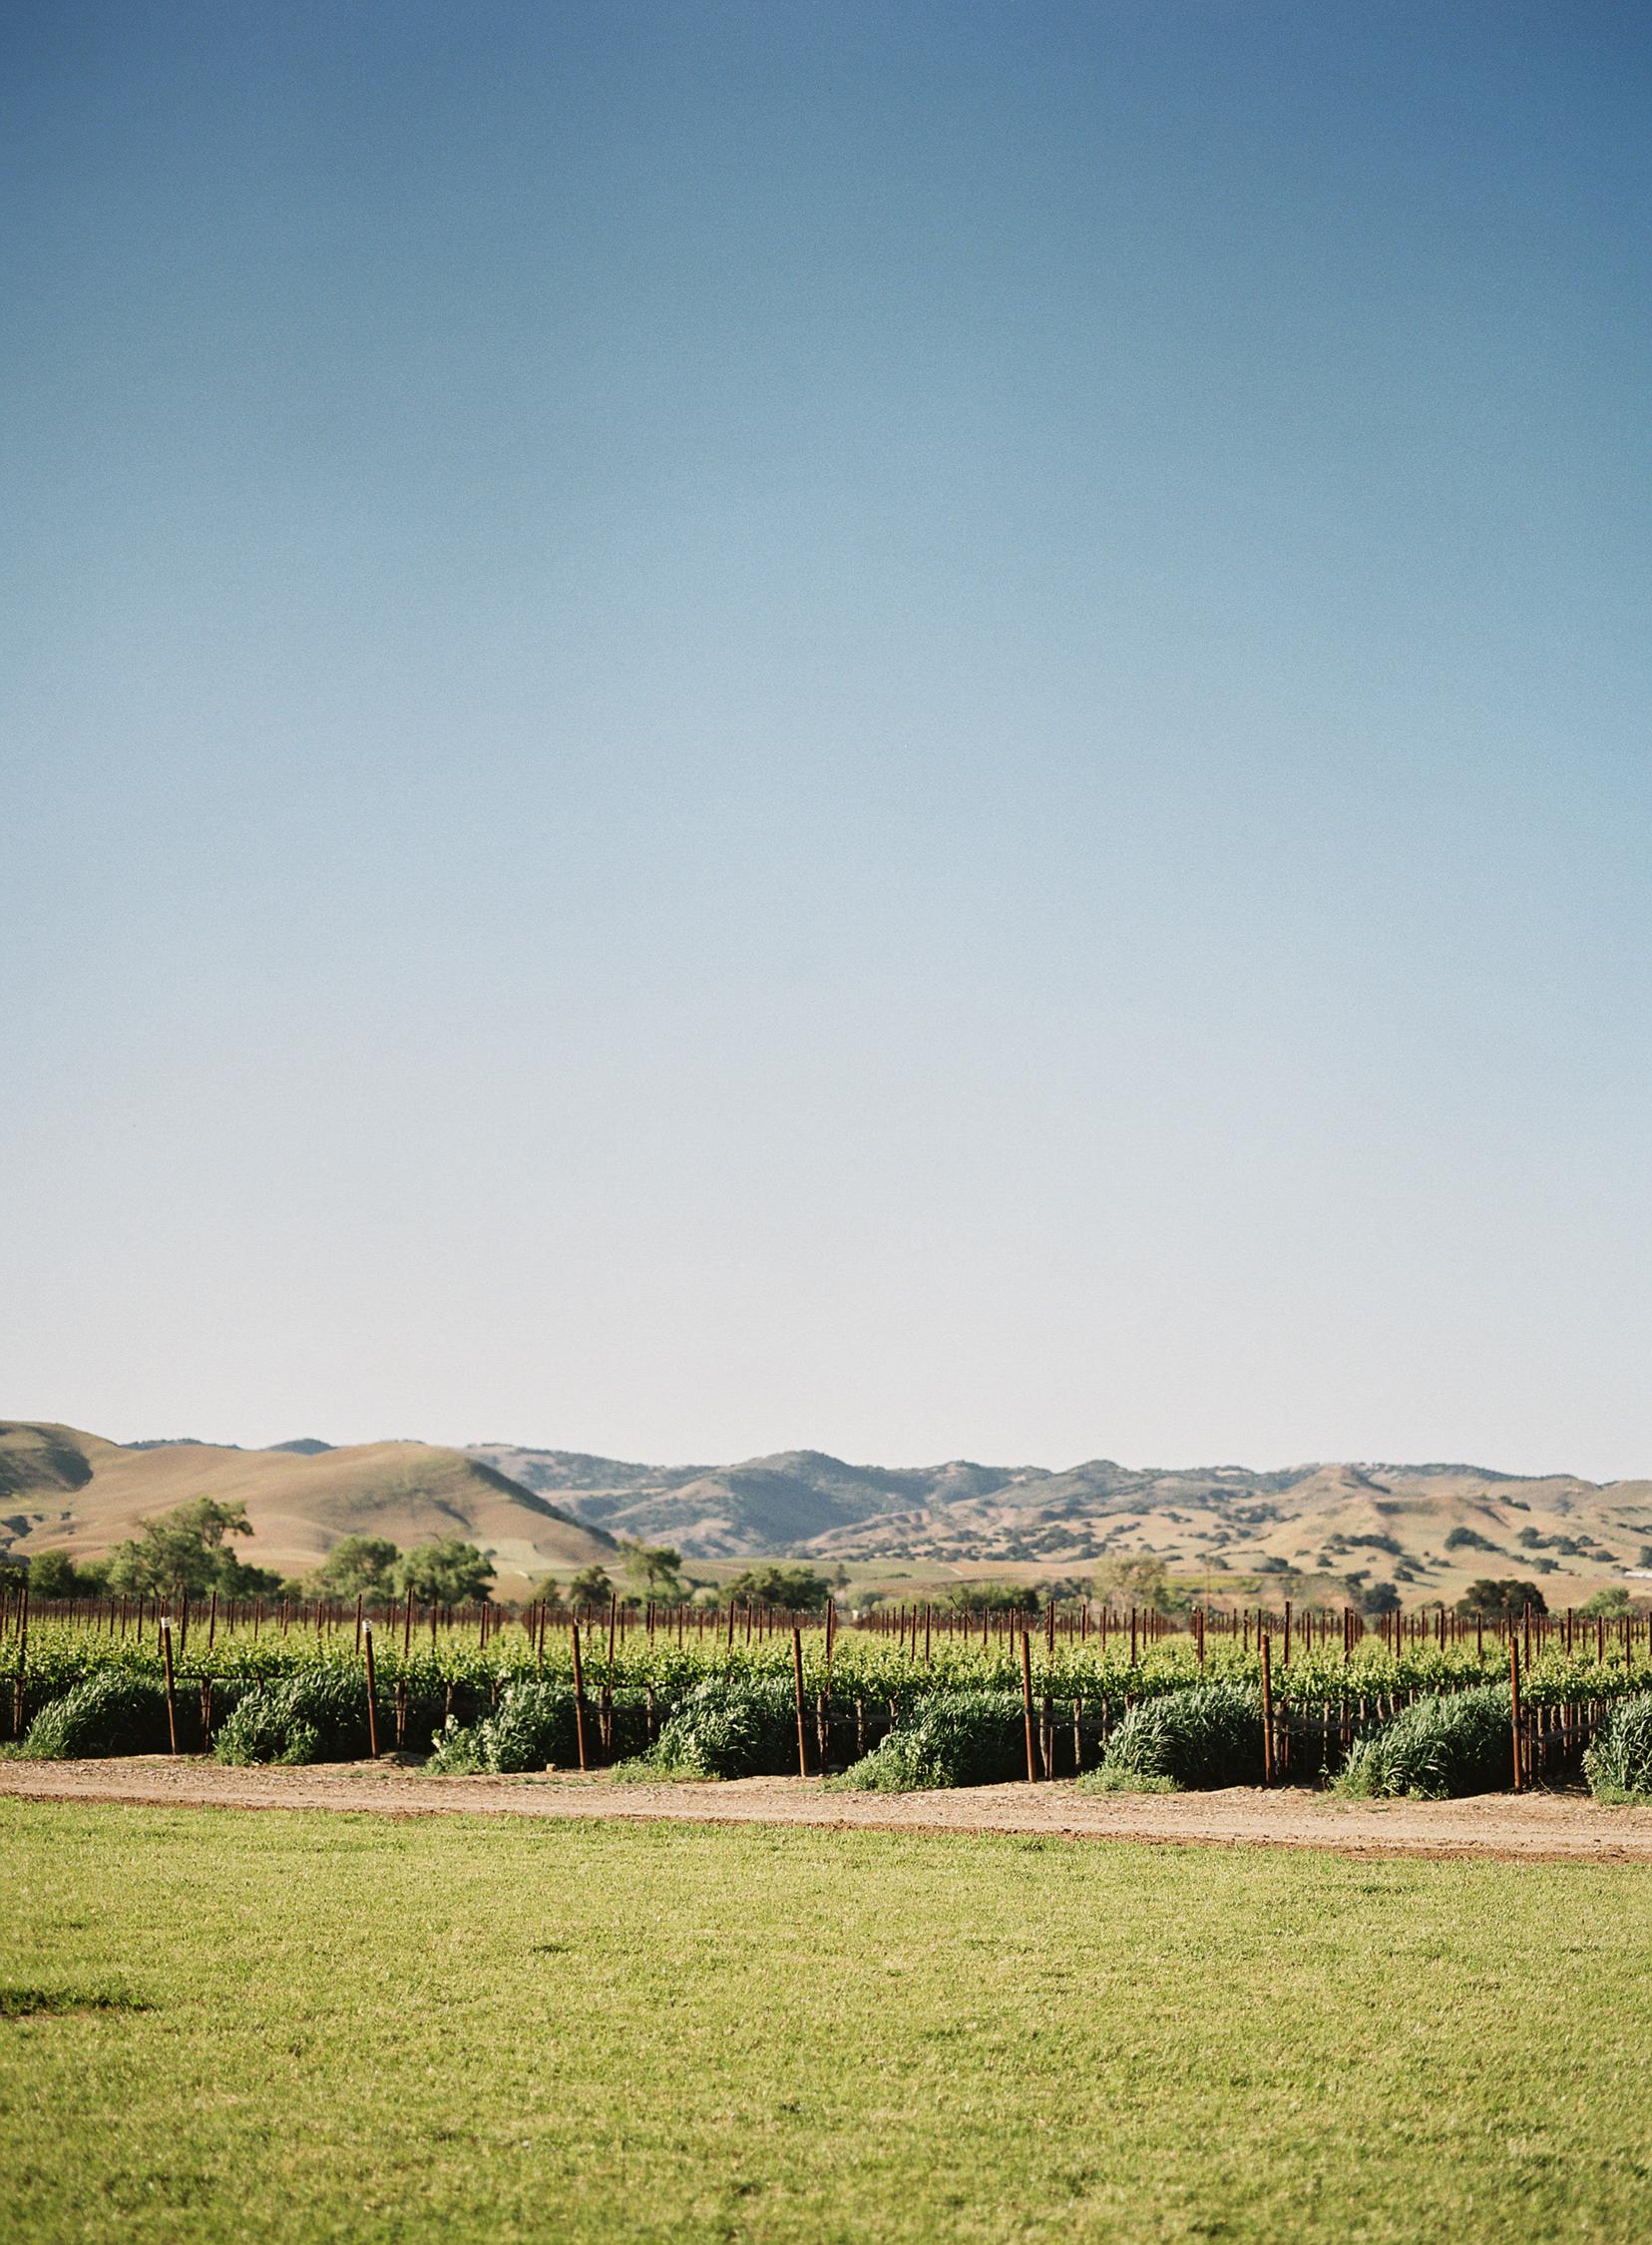 vineyard_Santa-Ynez_valley.jpg